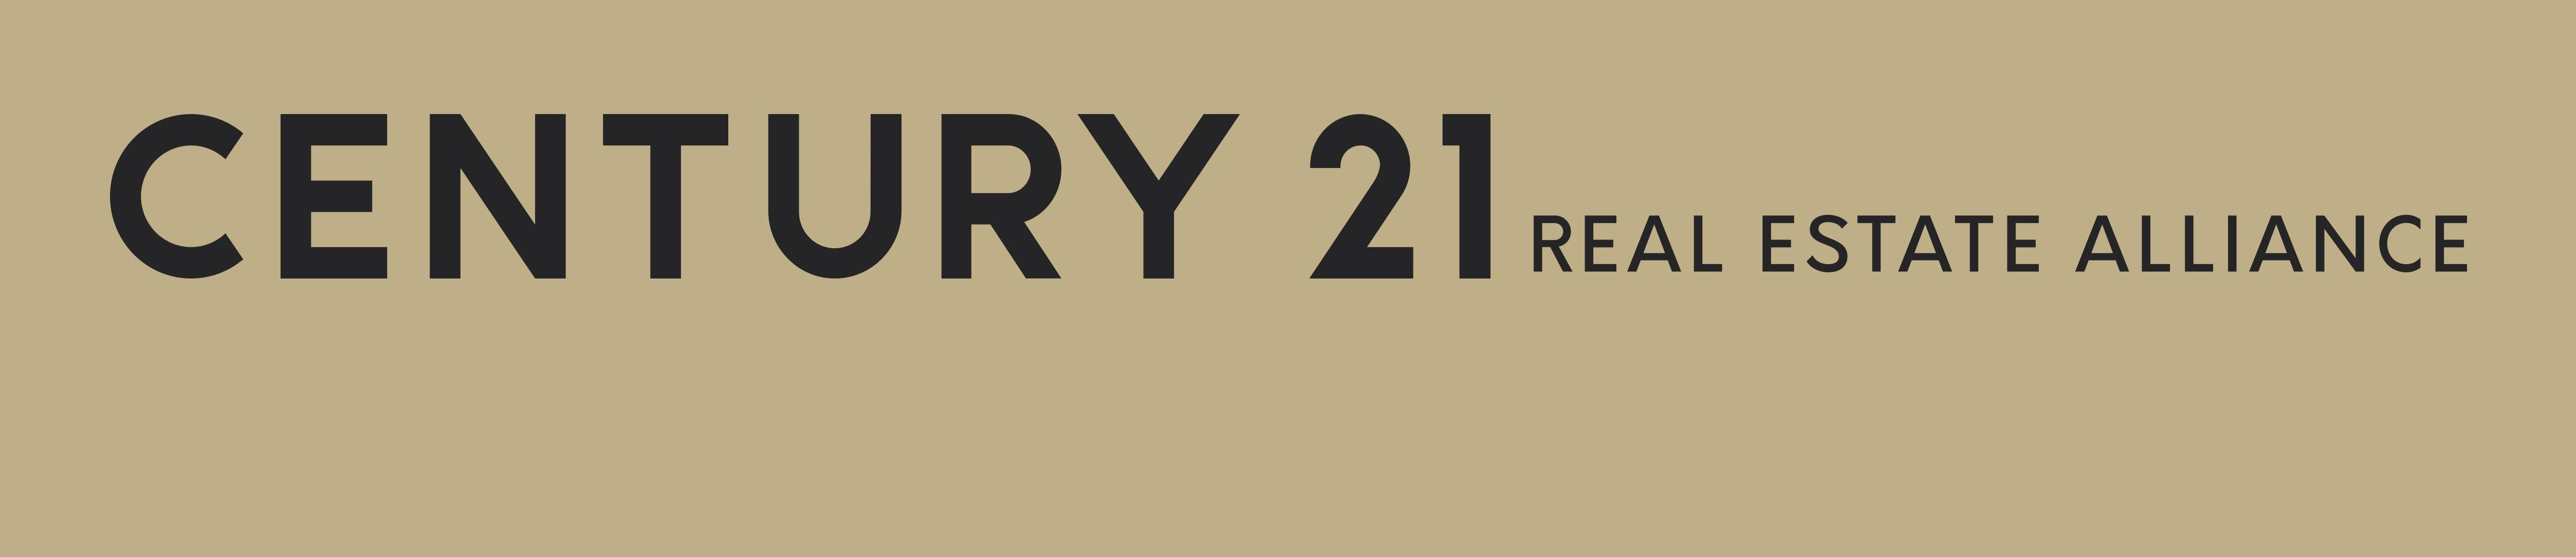 Century 21 Real Estate Alliance Inc